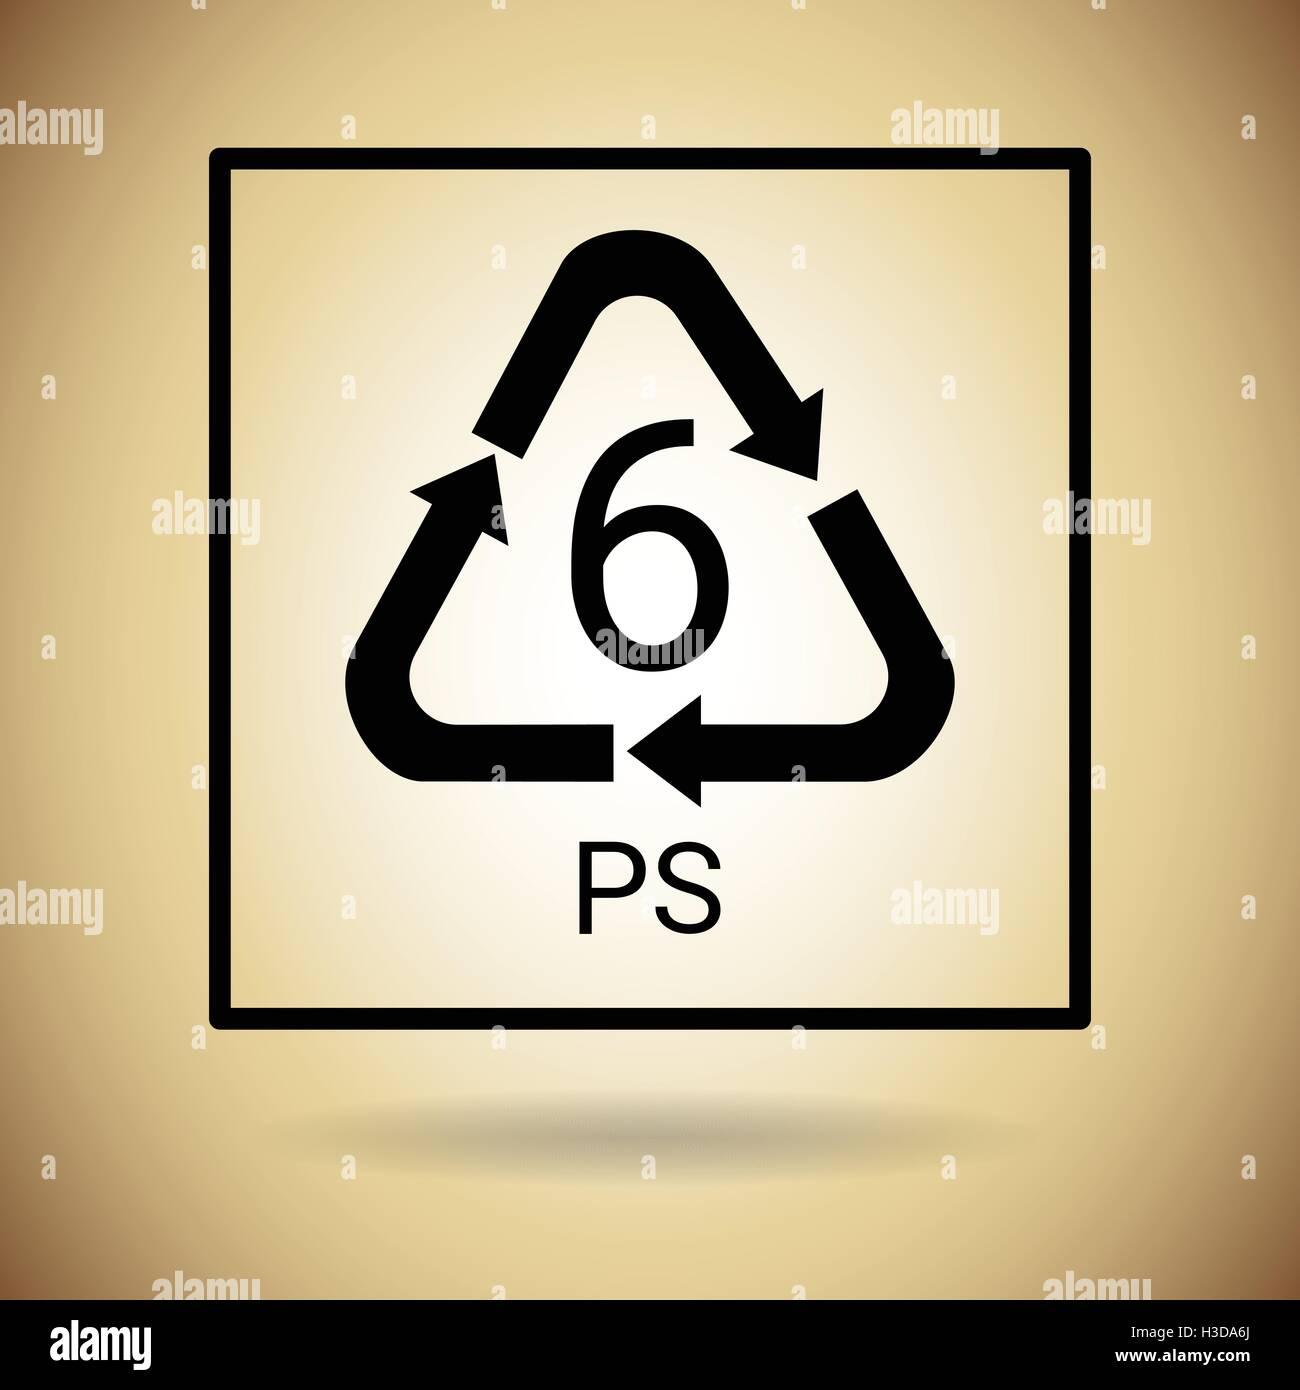 Recycle symbol logo web icon stock vector art illustration recycle symbol logo web icon buycottarizona